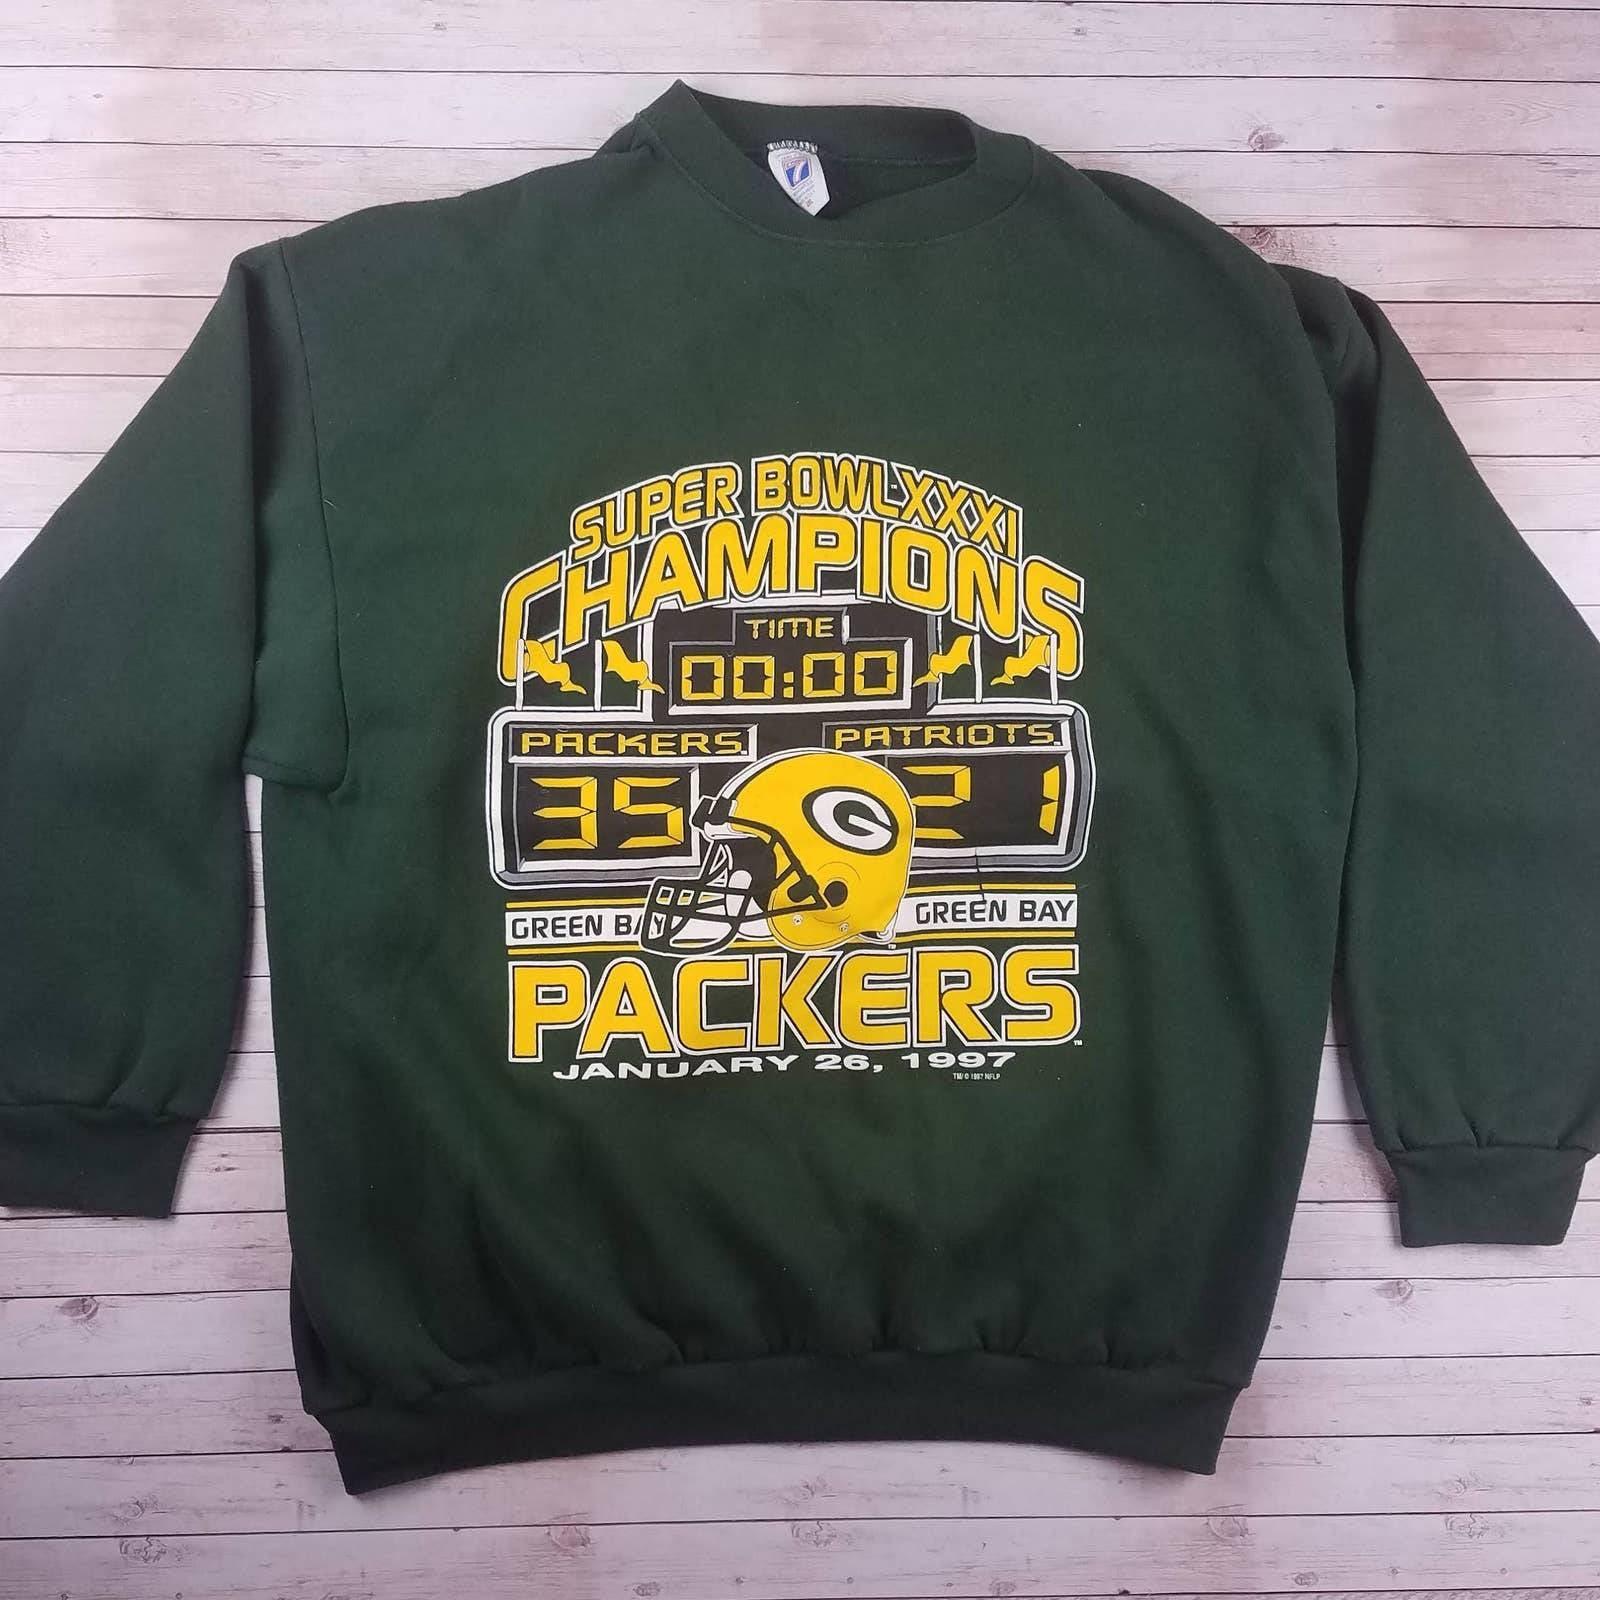 VTG 90s Packers SB Champs Sweatshirt